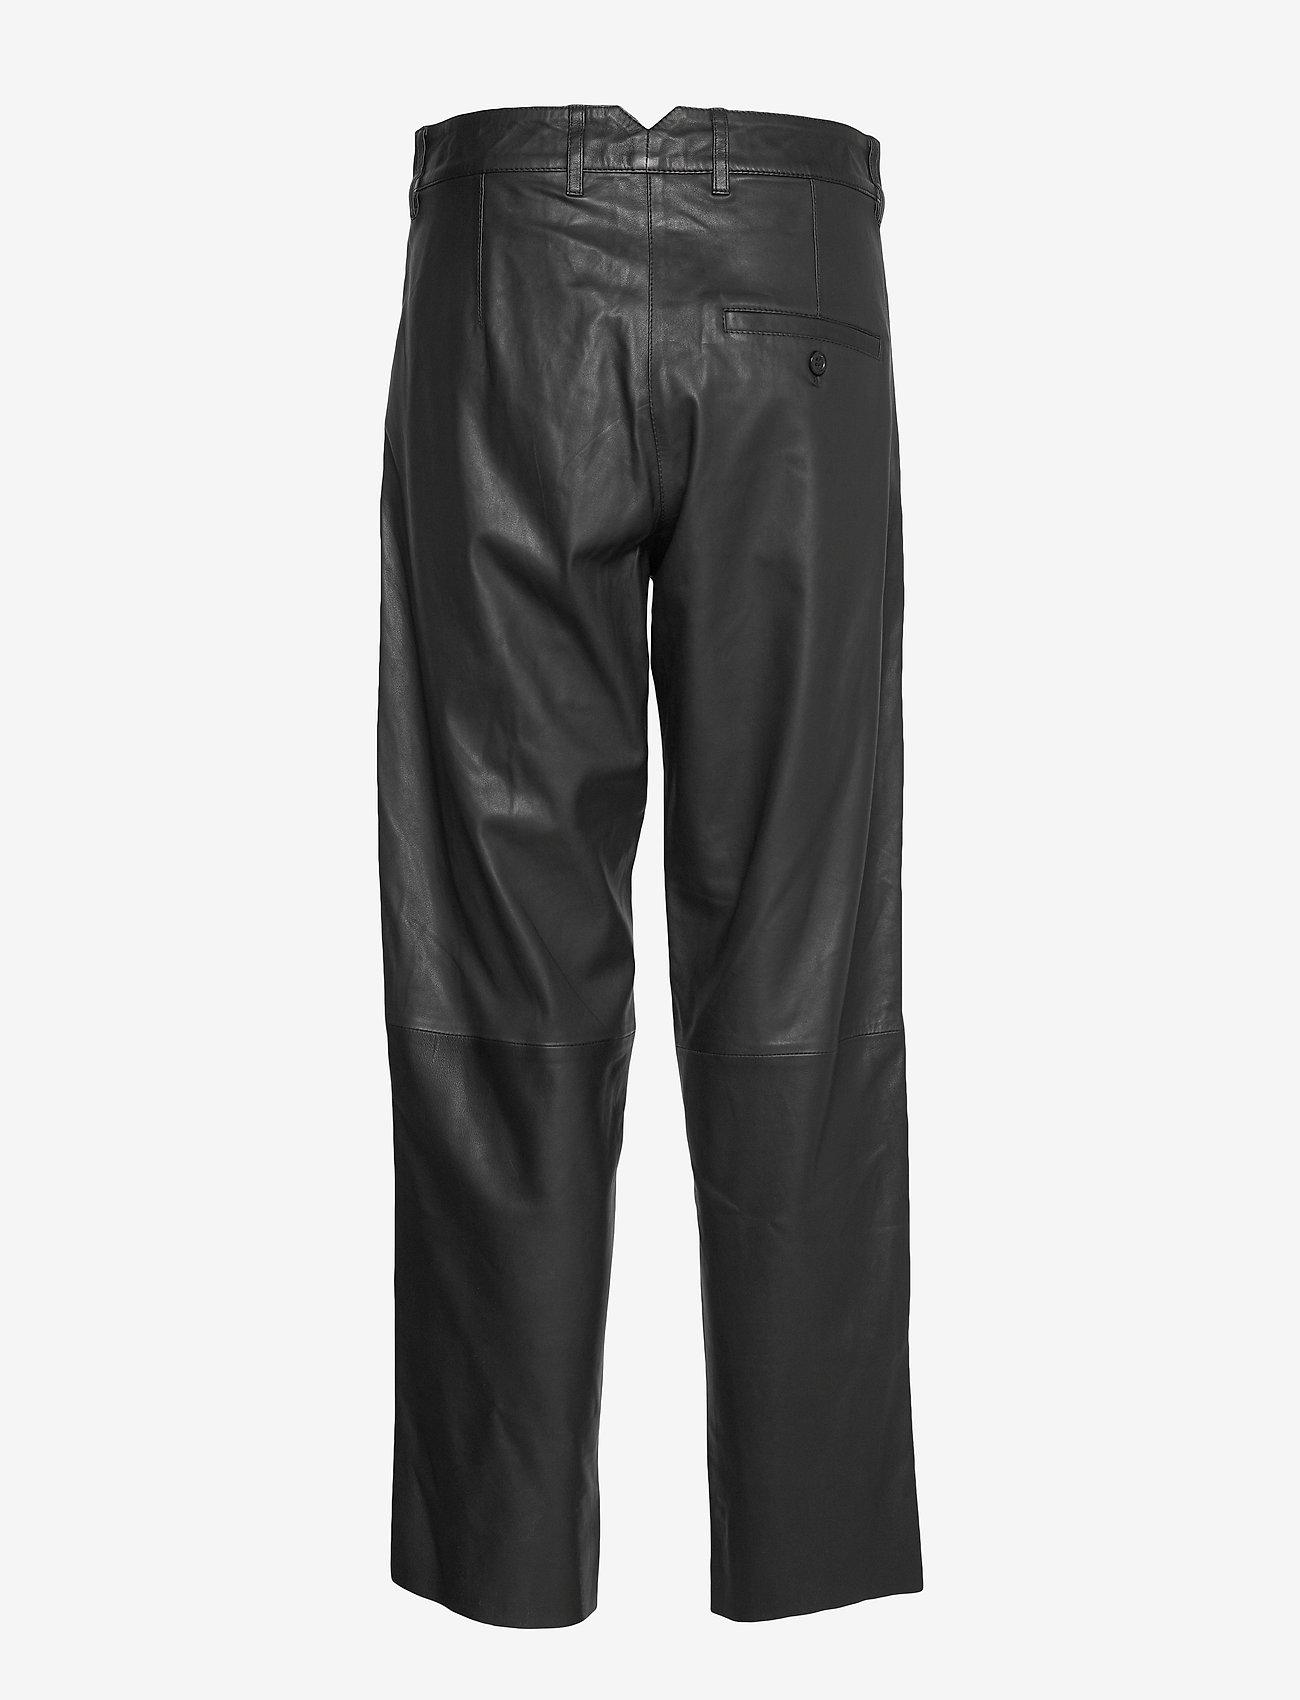 MDK / Munderingskompagniet - Iris leather pants - skinnbyxor - black - 1